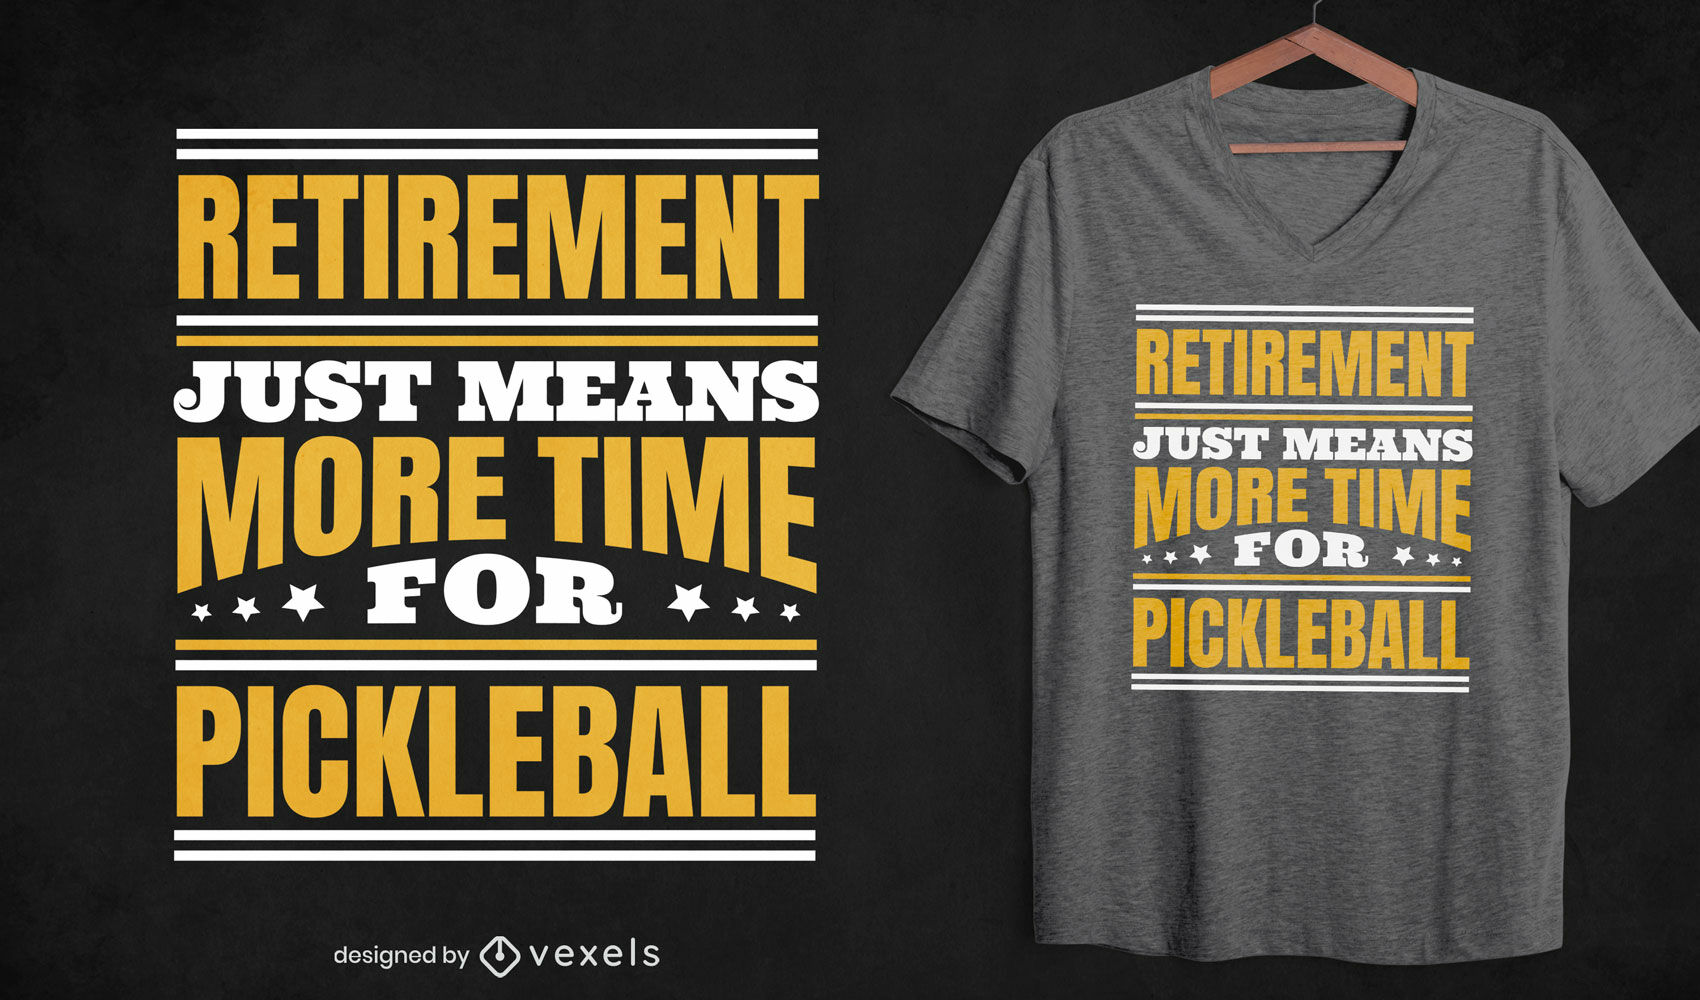 Dise?o de camiseta de cita de pickleball de jubilaci?n